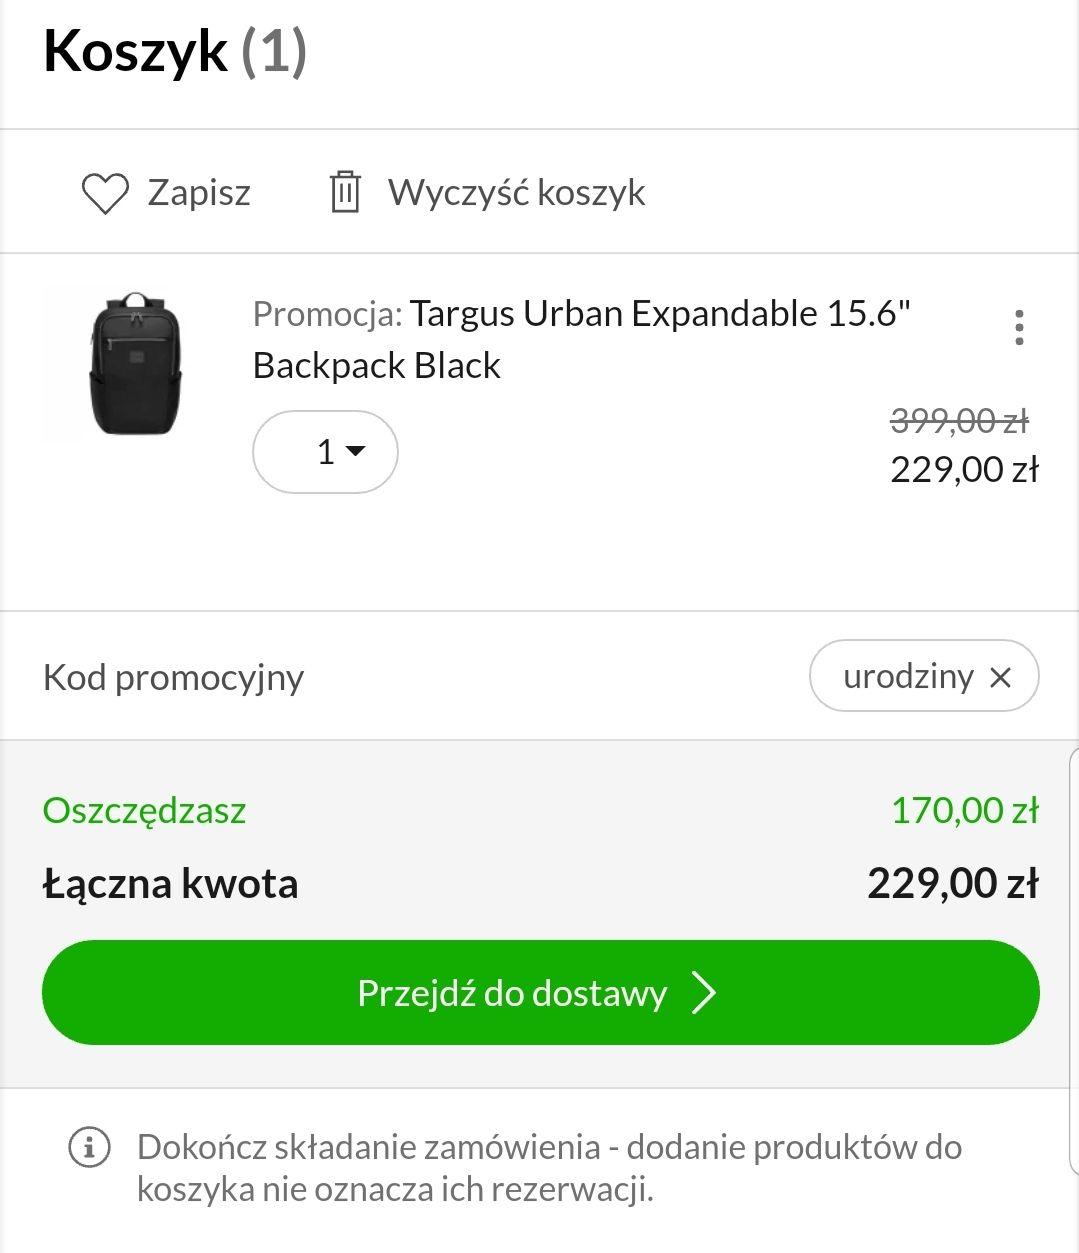 "Targus Urban Expandable 15.6"" Backpack Black"